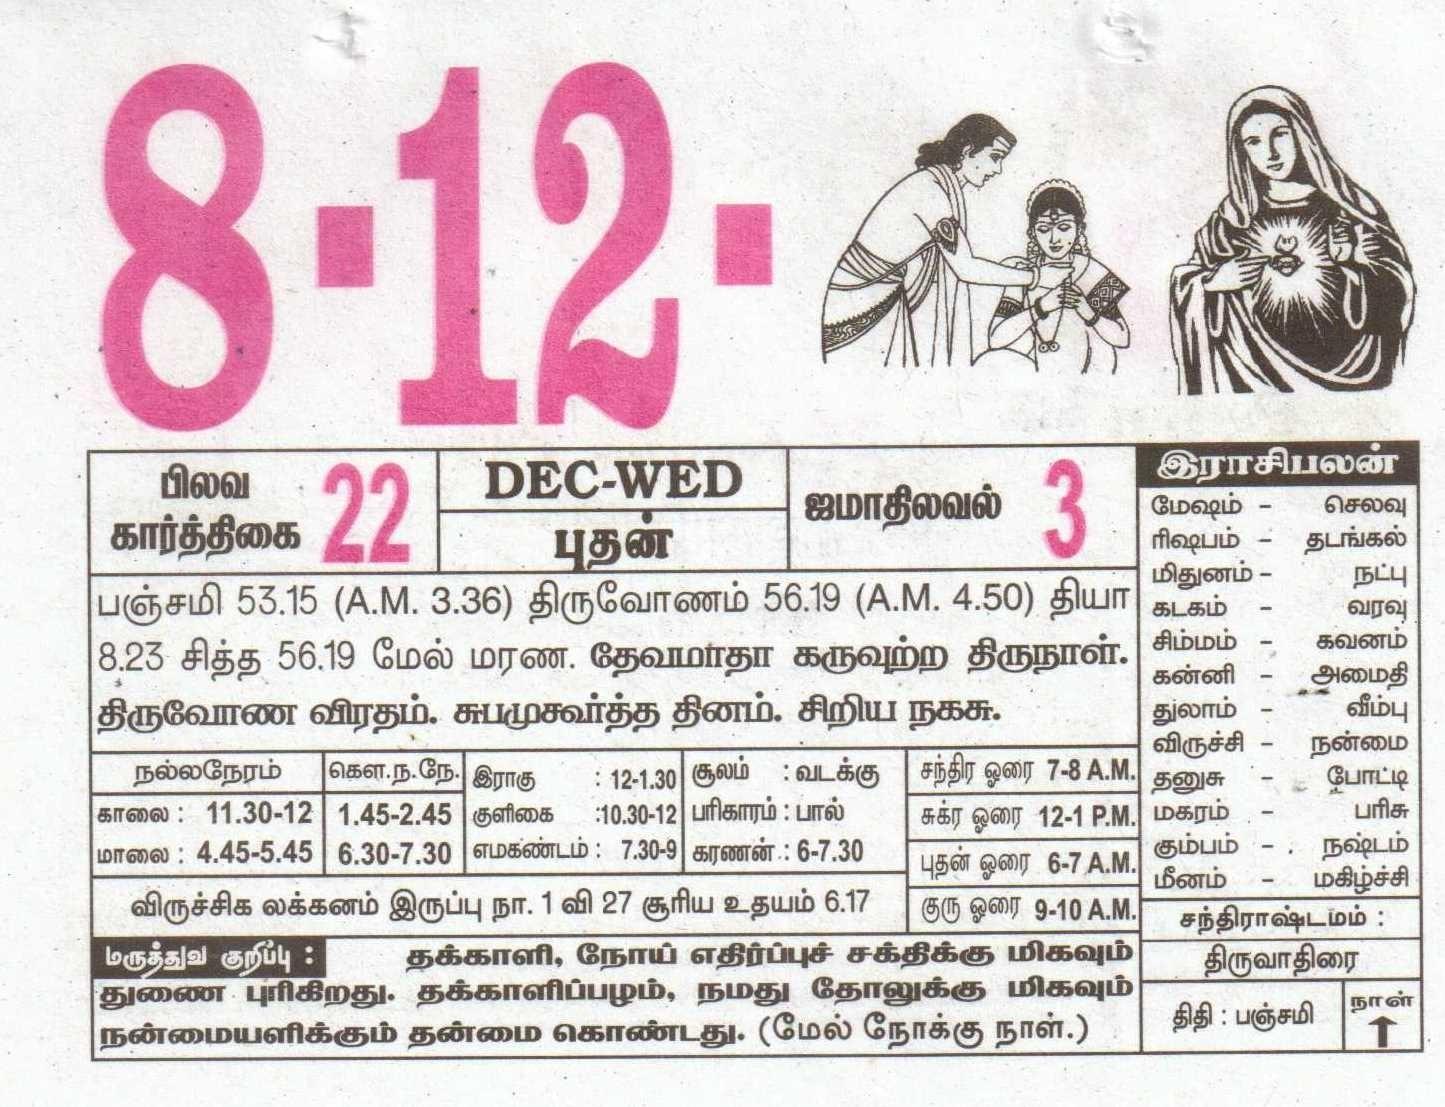 08-12-2021 Daily Calendar | Date 08 , January Daily Tear Off Calendar | Daily Panchangam Rasi Palan August 2021 Tamil Daily Calendar